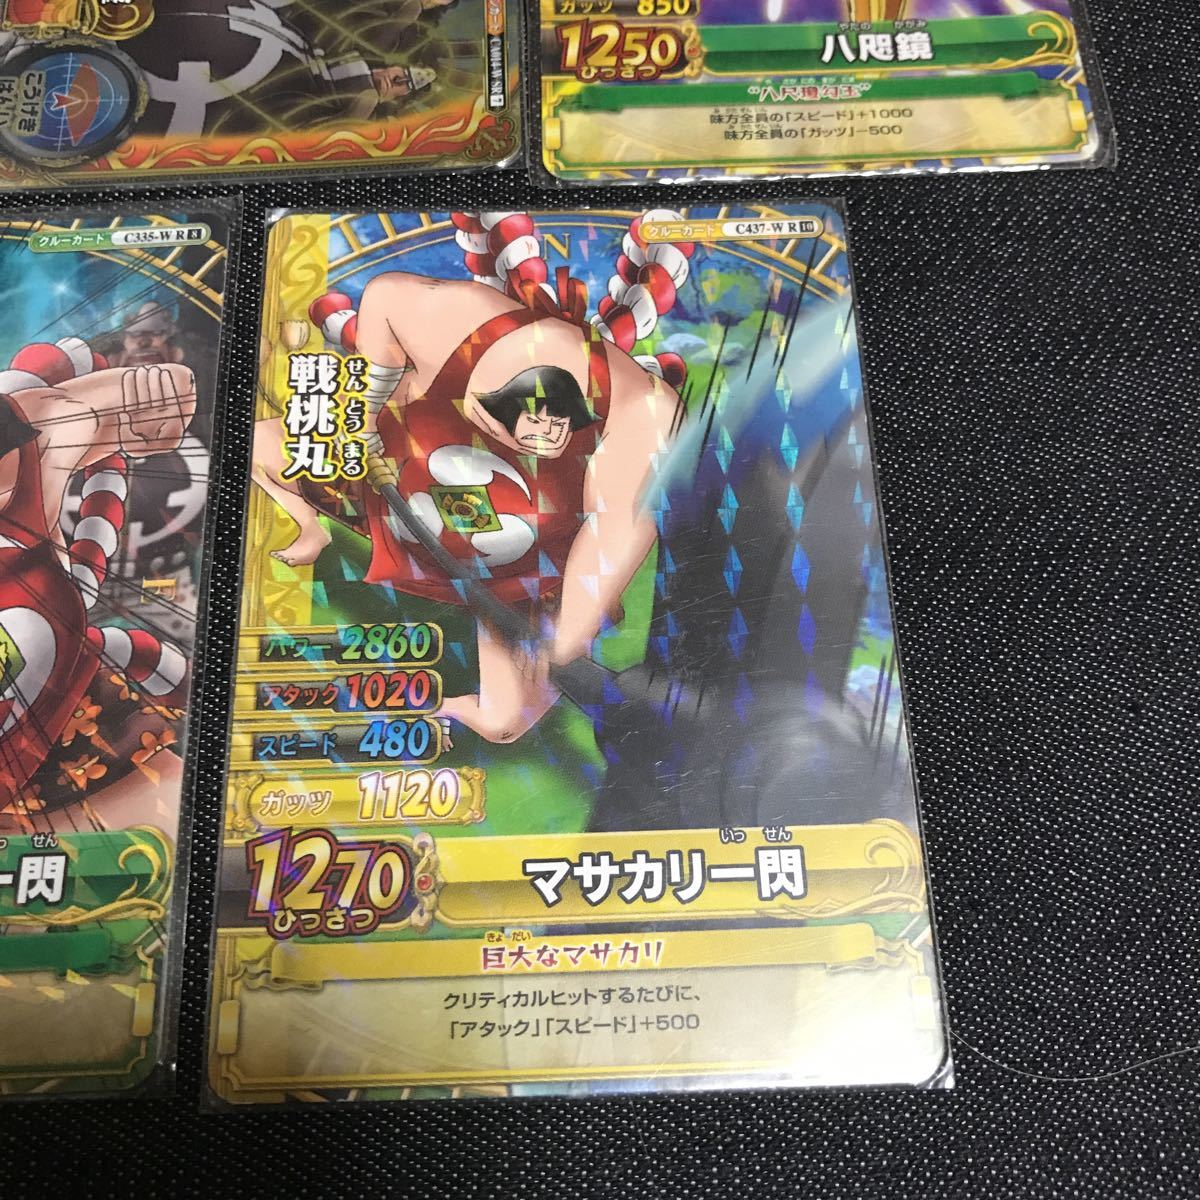 【ONE PIECE】ワンピーベリーマッチダブル 黄猿 ボルサリーノ & 戦桃丸 セット_画像5